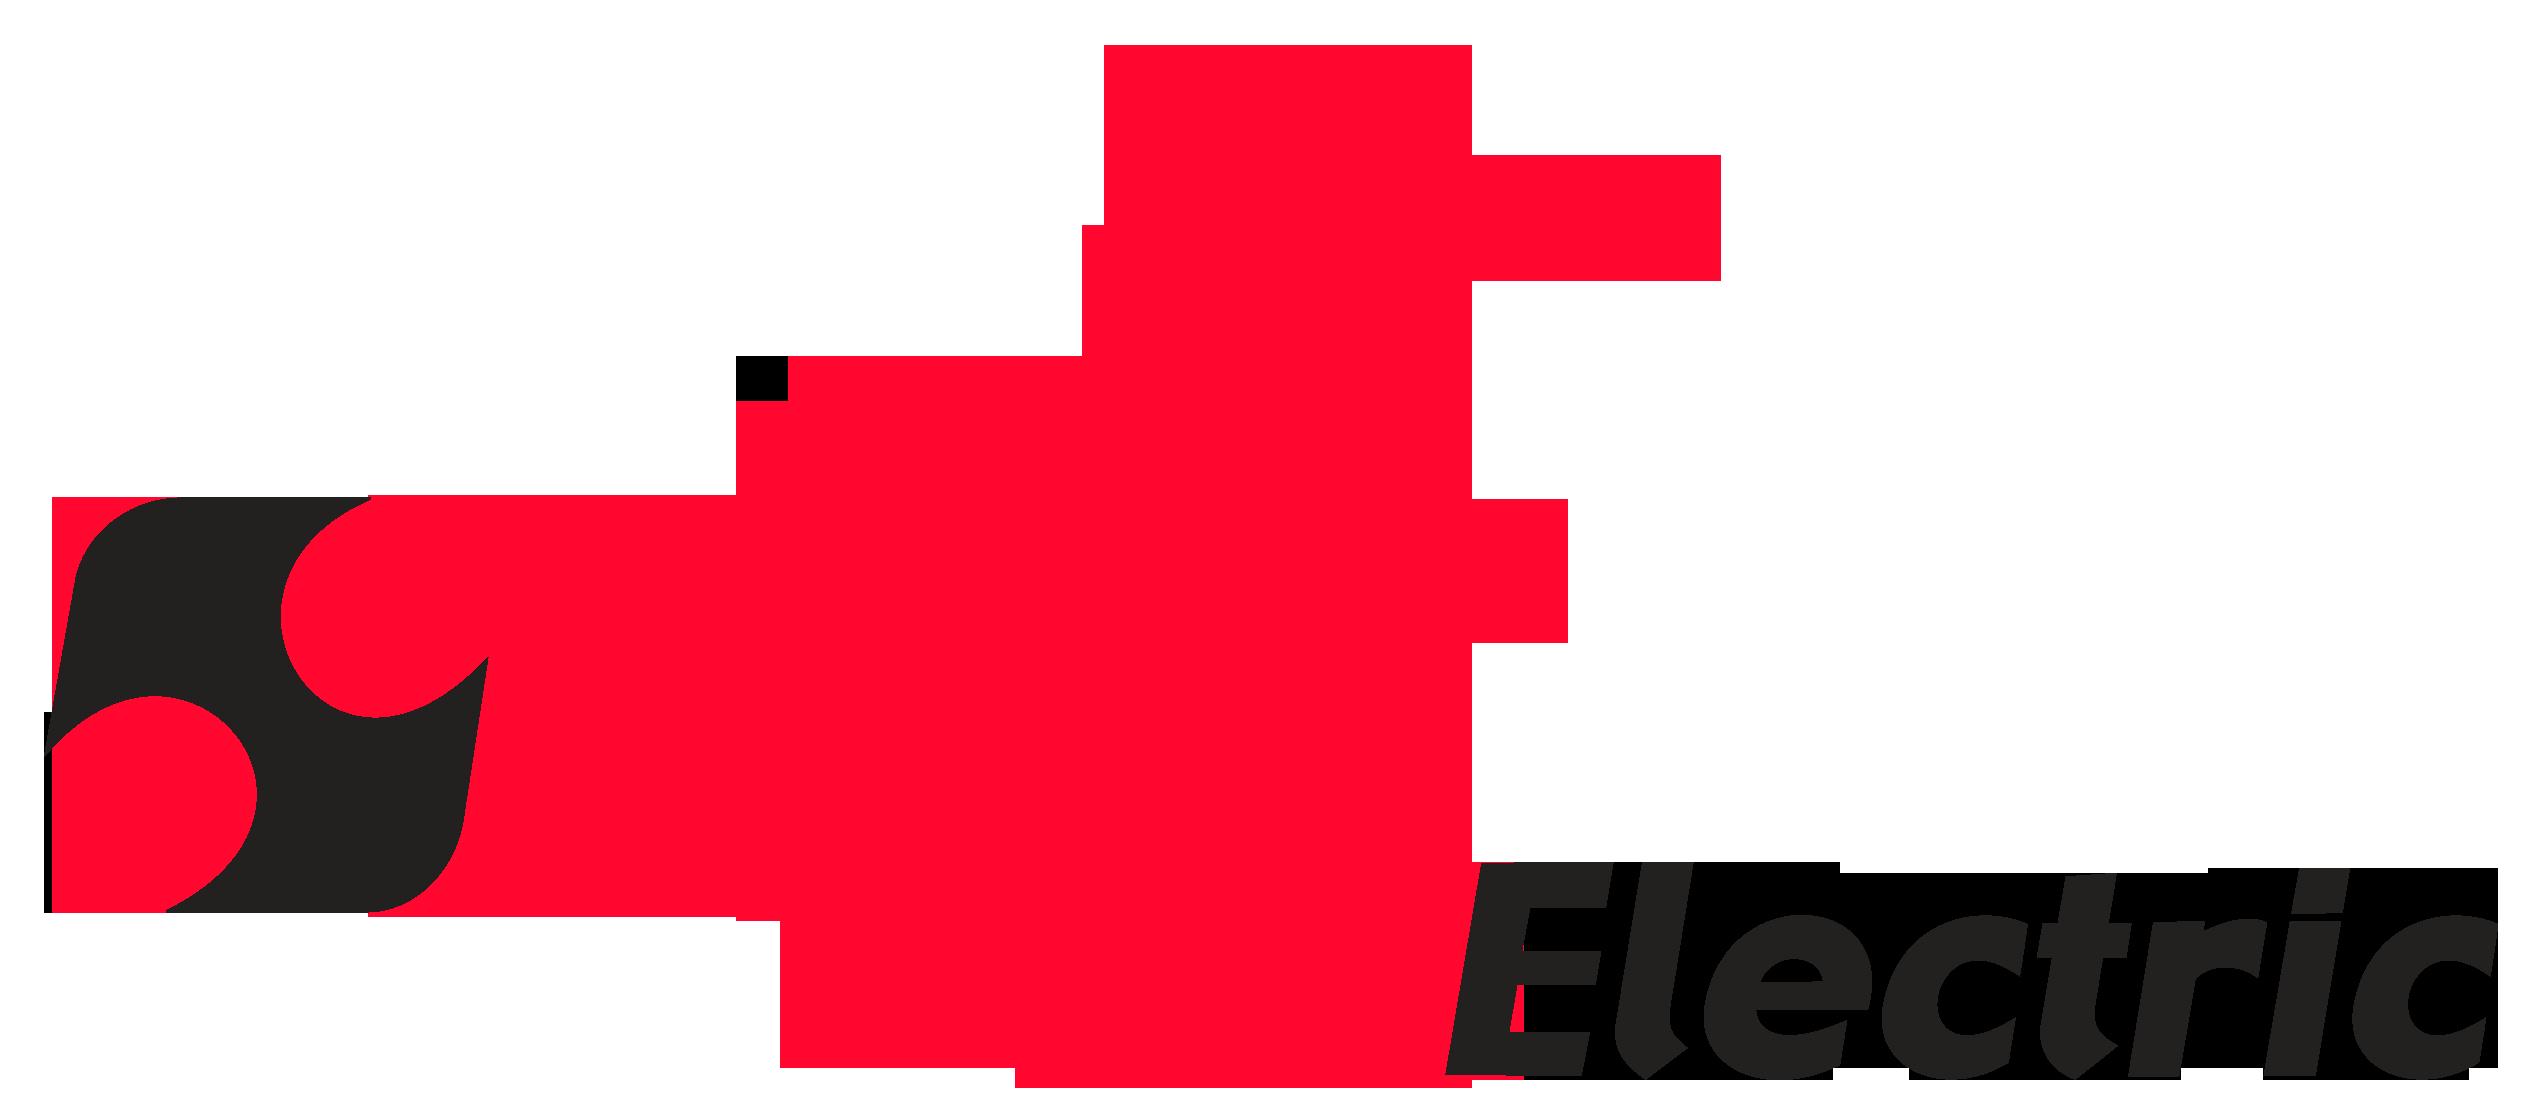 DF Electric-Spain